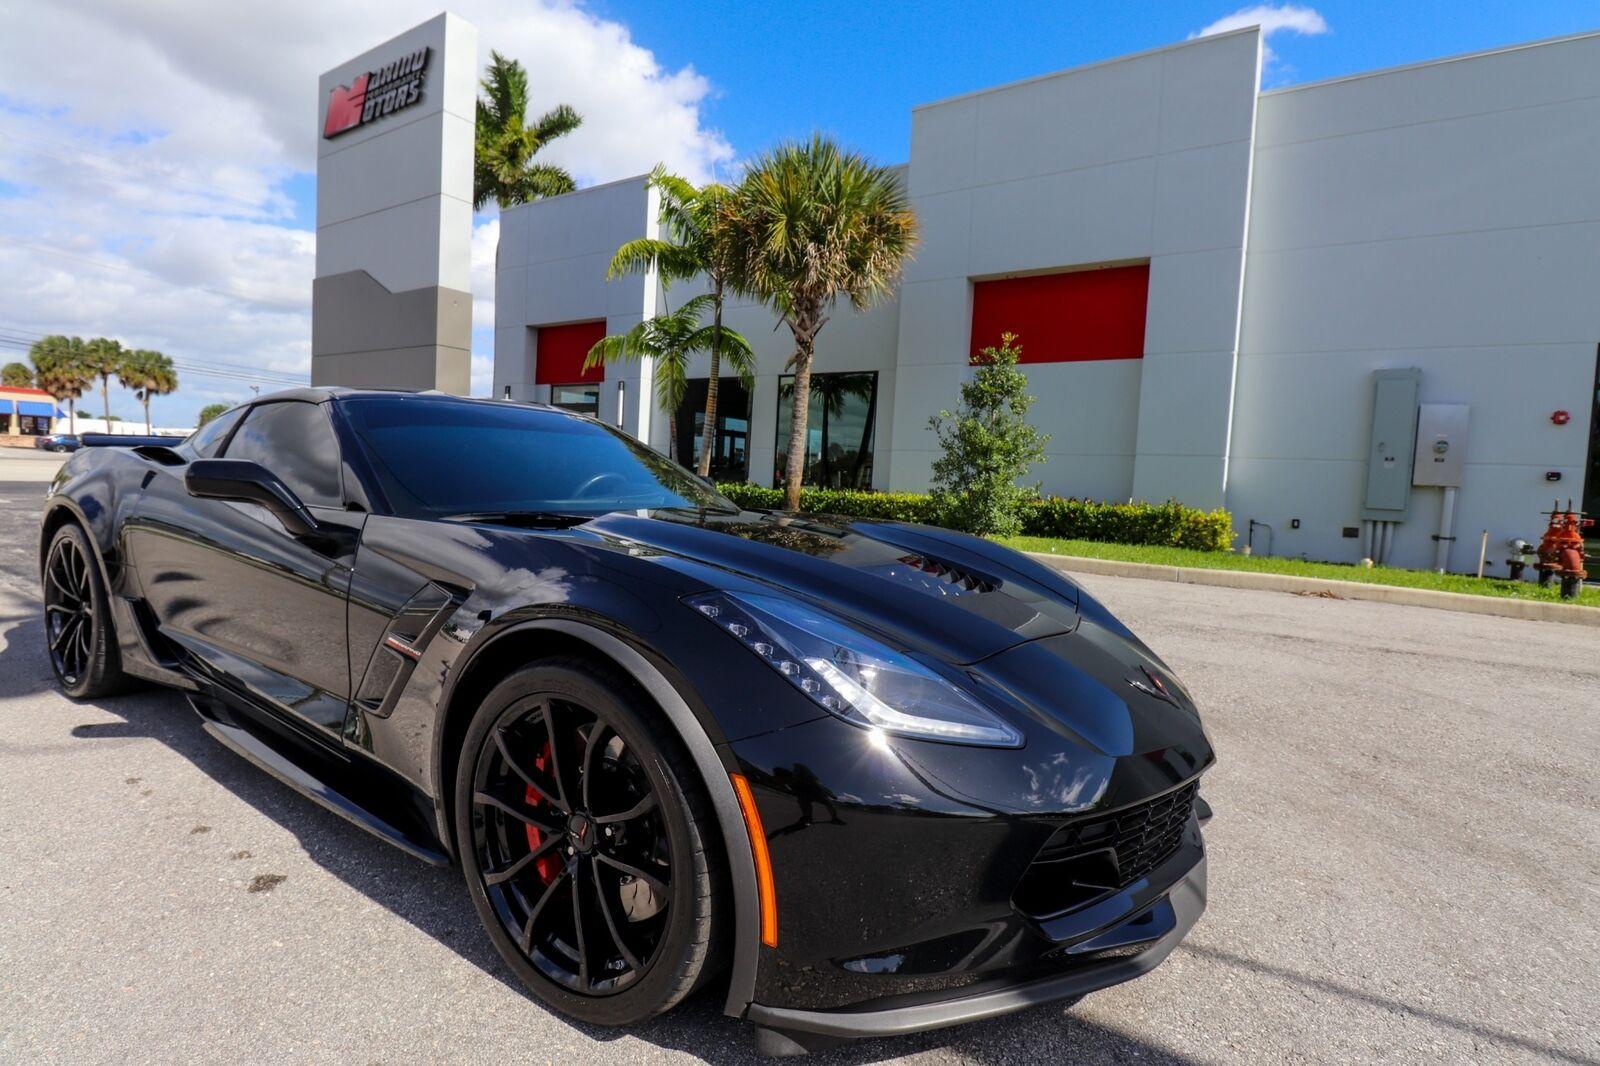 2018 Black Chevrolet Corvette Grand Sport    C7 Corvette Photo 1